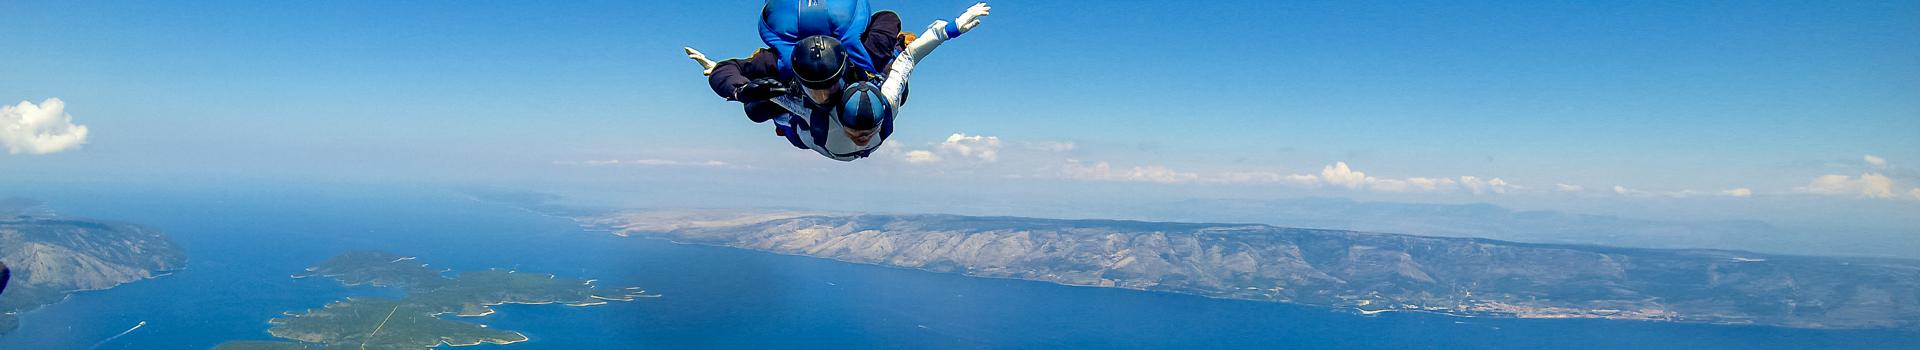 Skydive-Hvar-slider-photo